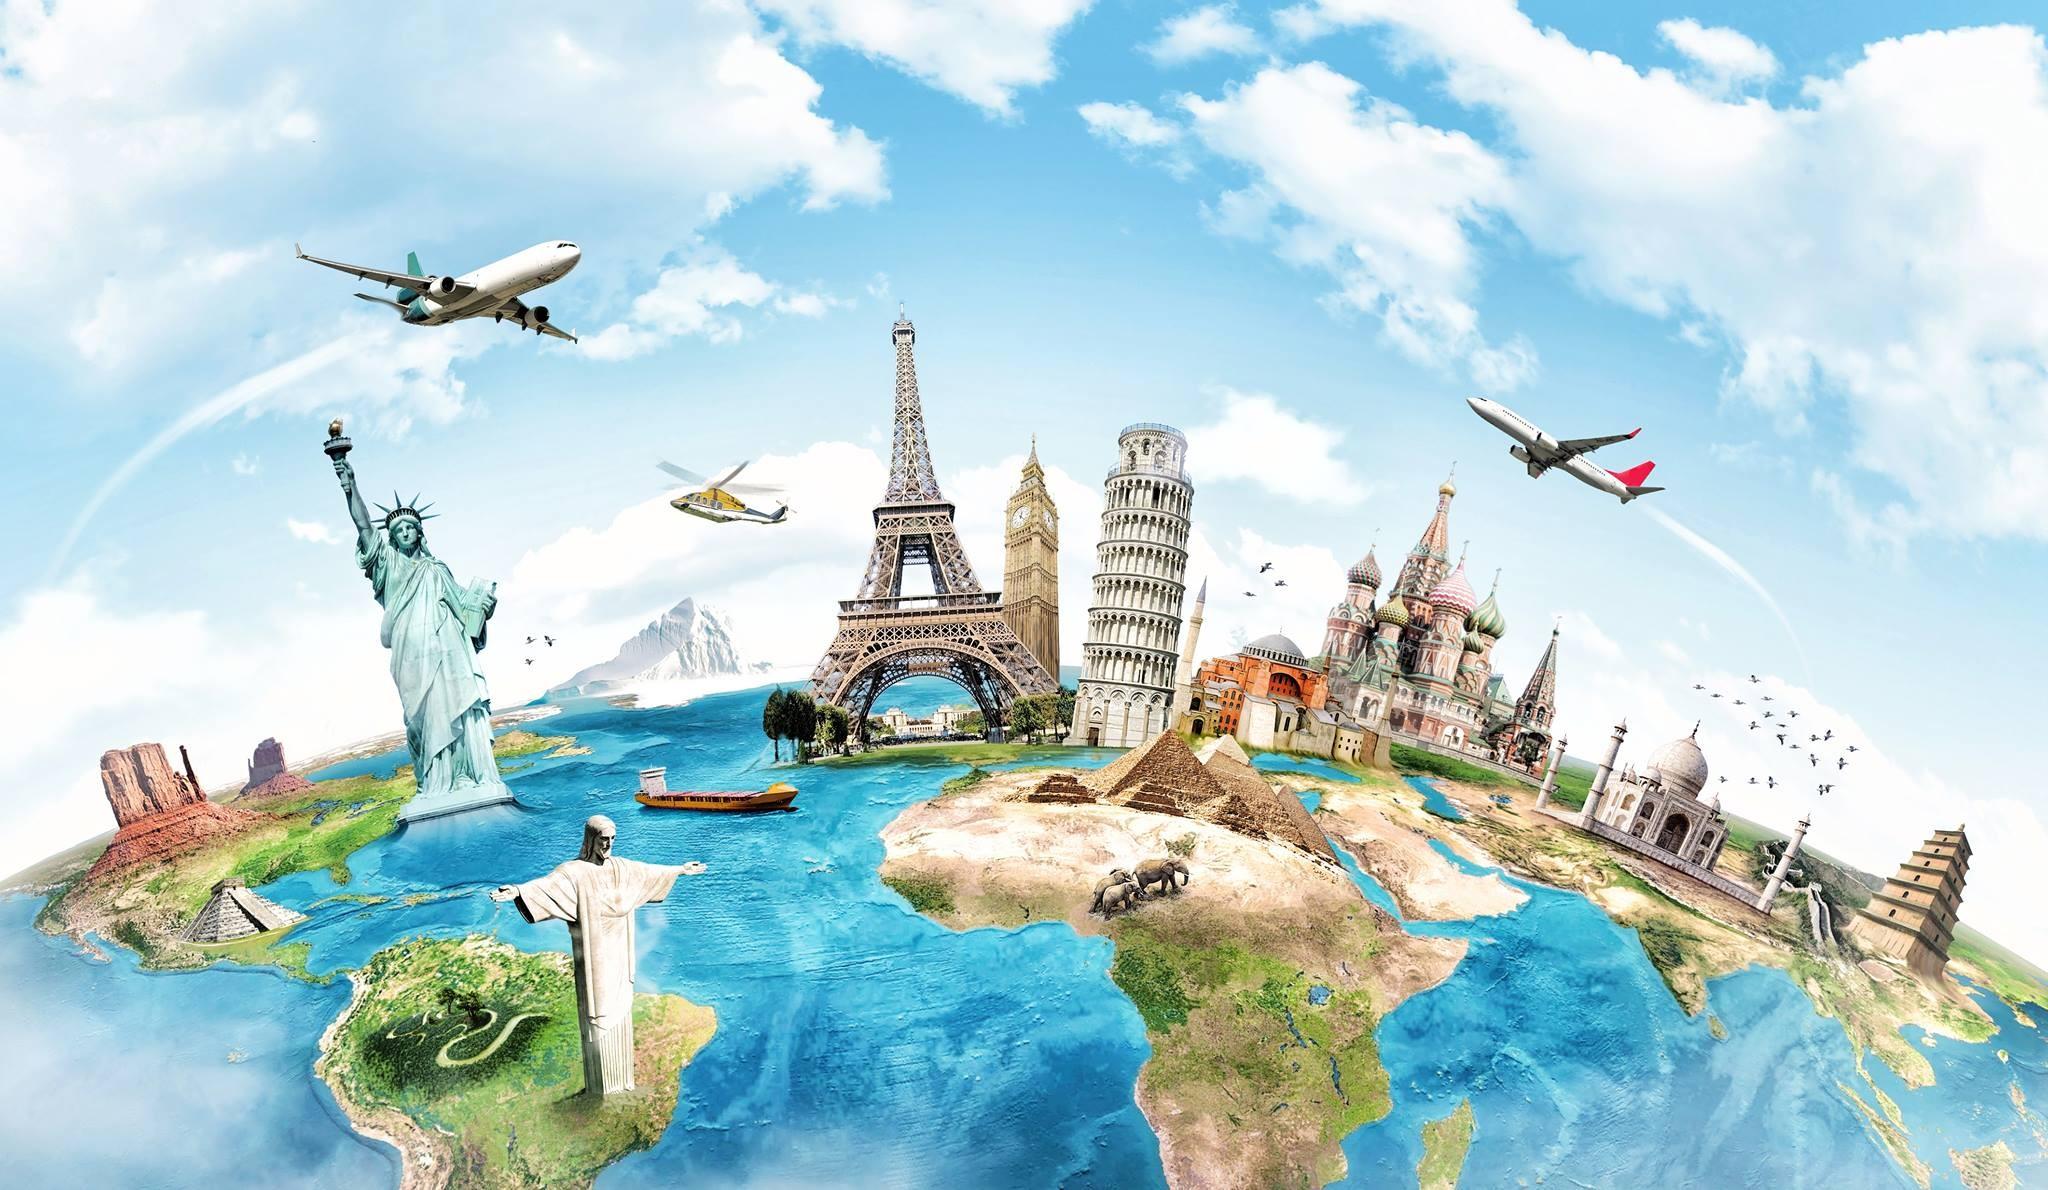 AlFahad Travel & Tourism Group Co  | LinkedIn